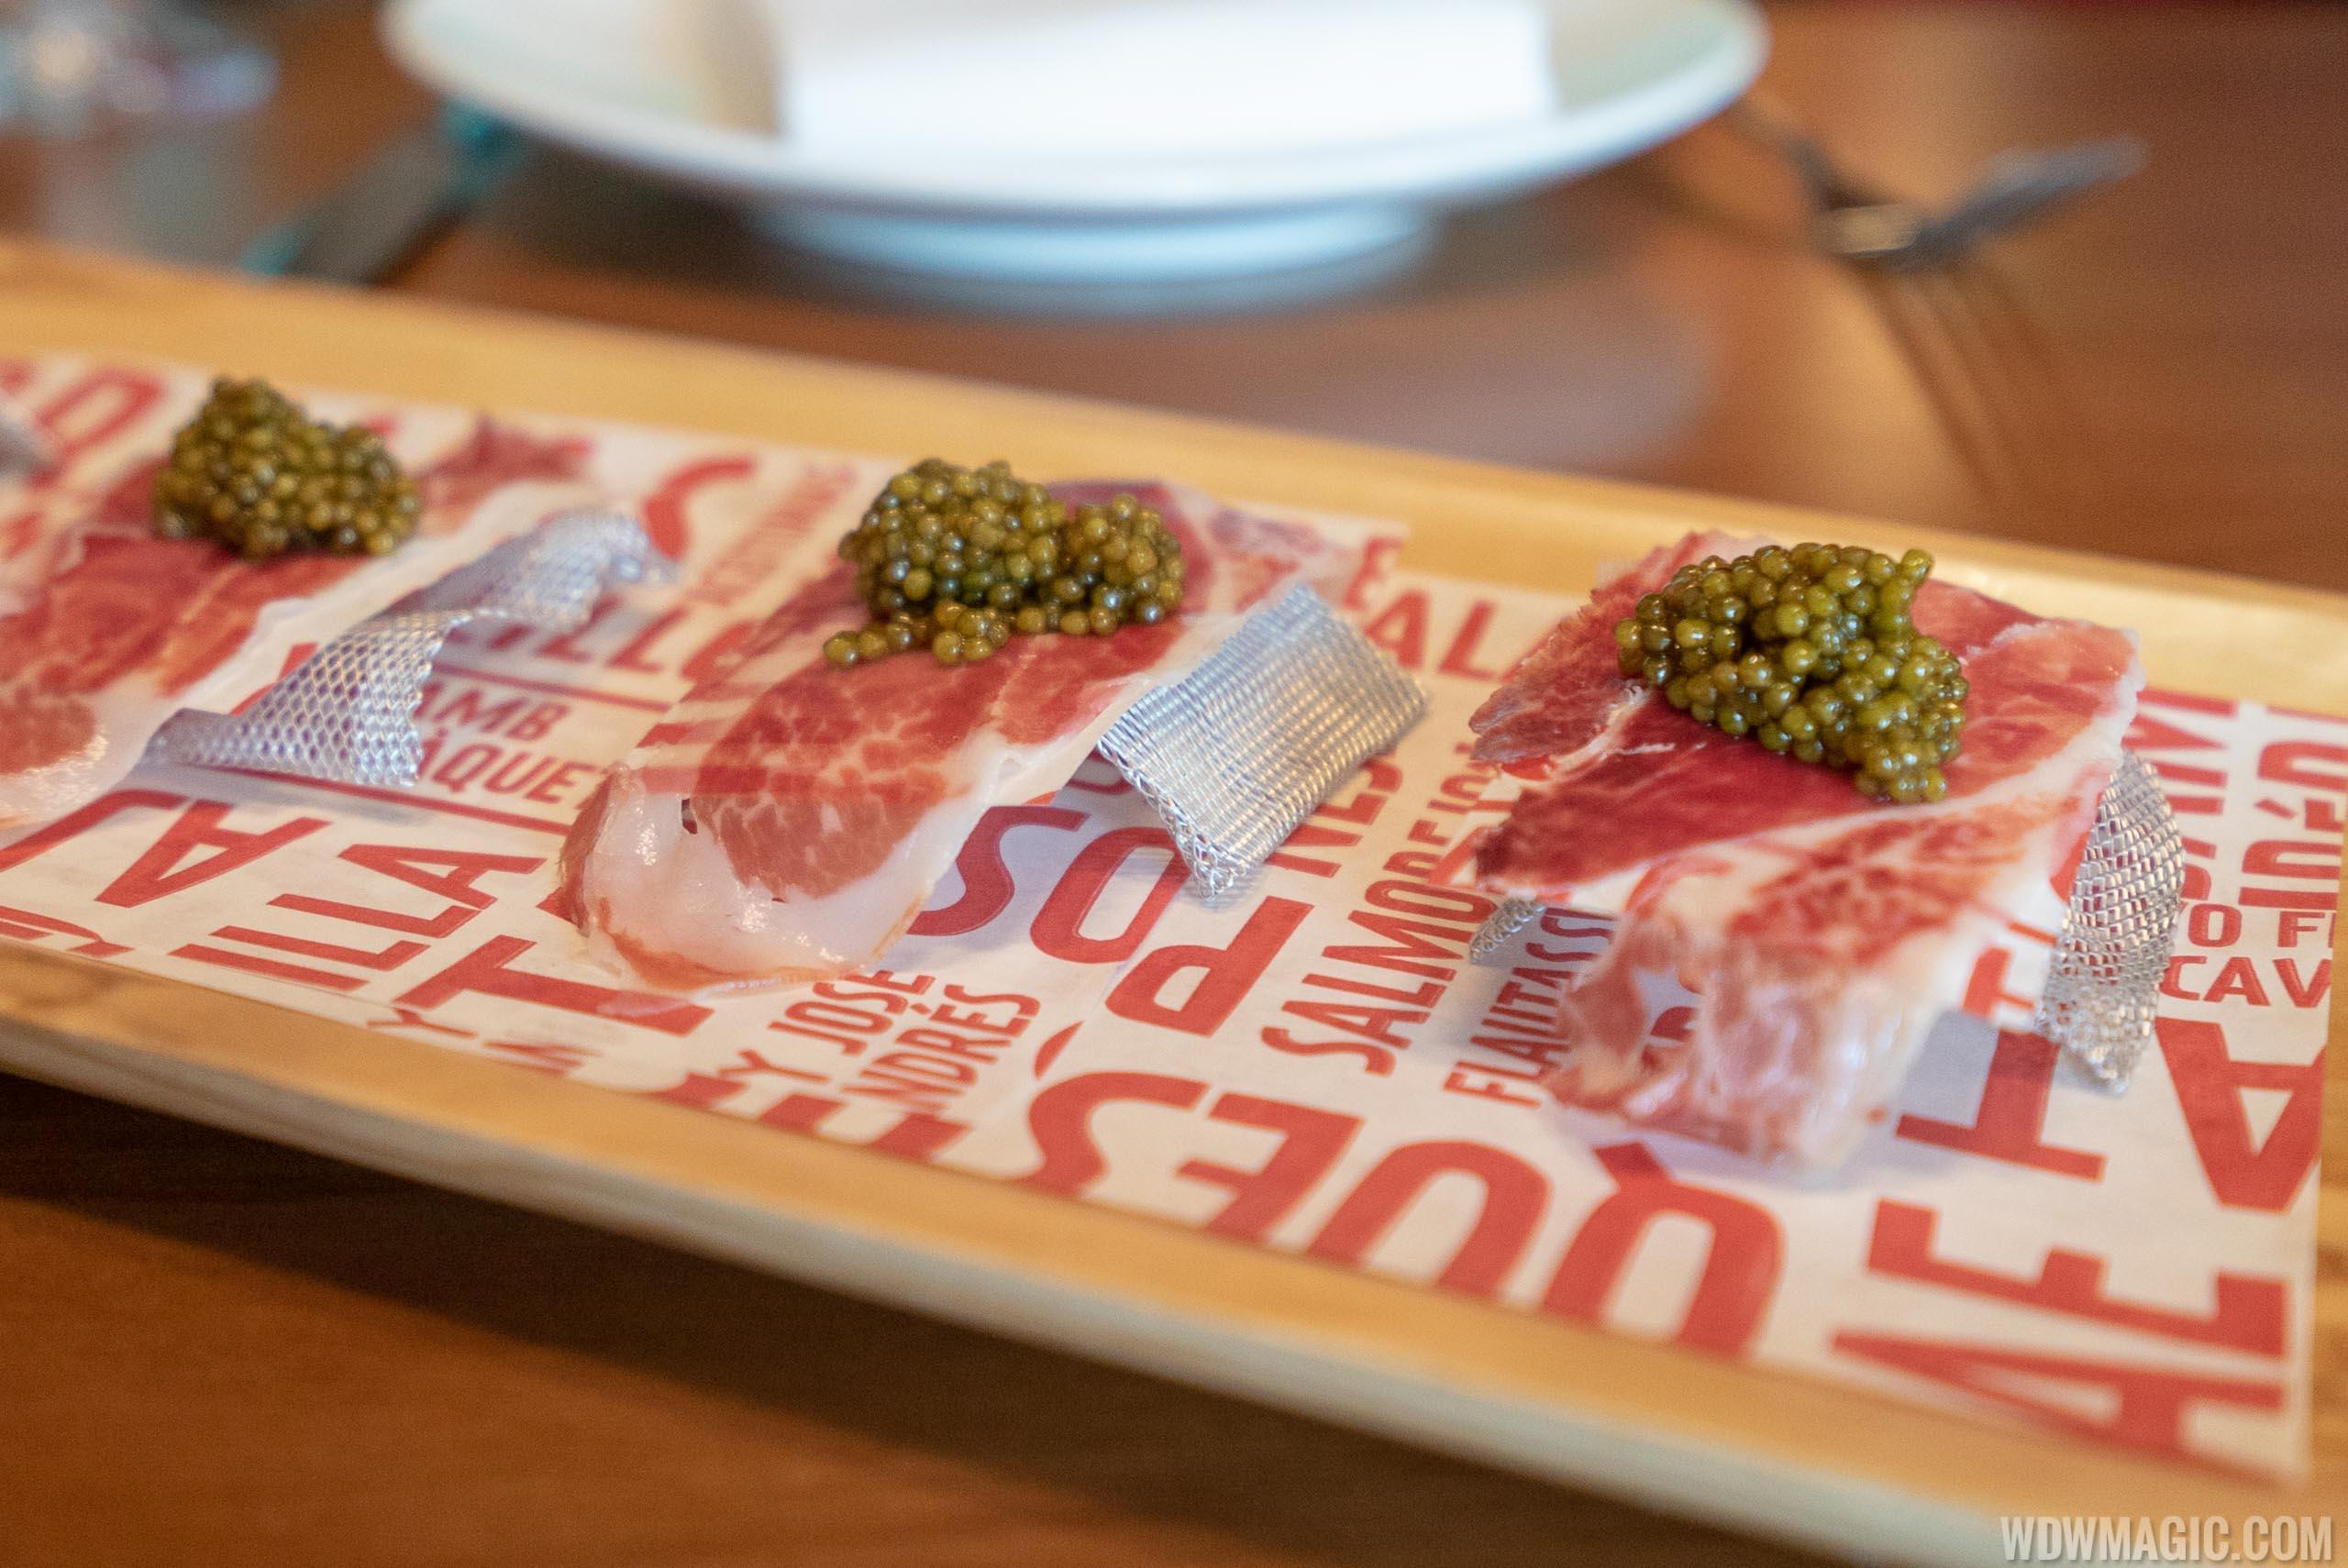 Chef's tasting menu: José's Way - Ibérico de bellota and Supreme caviar